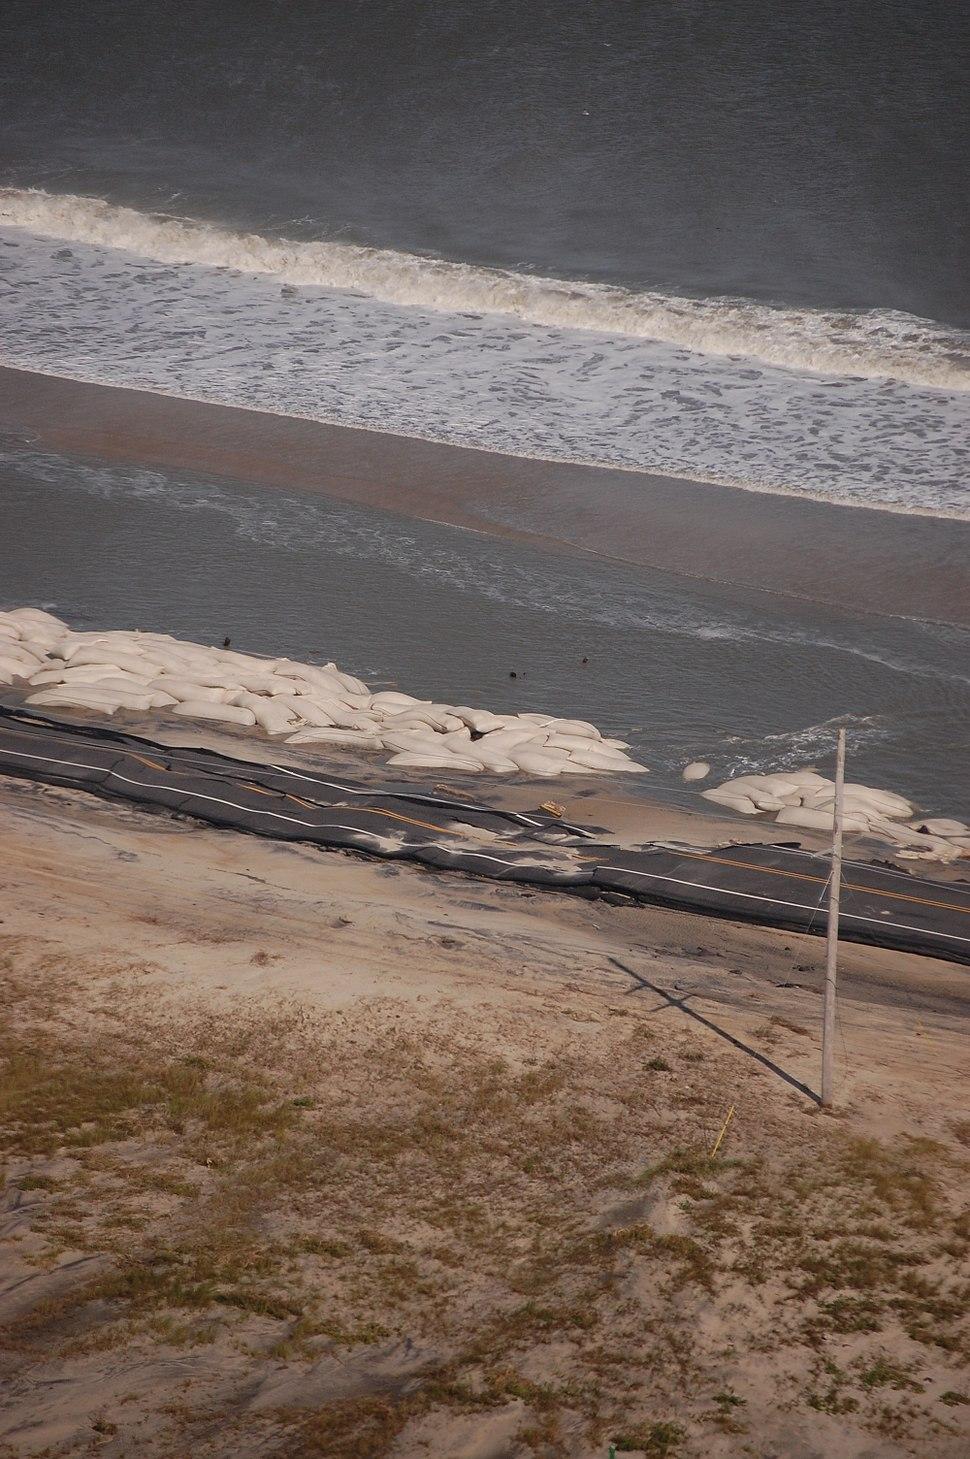 Hurricane Sandy - sandbagged beach, Cape Hatteras